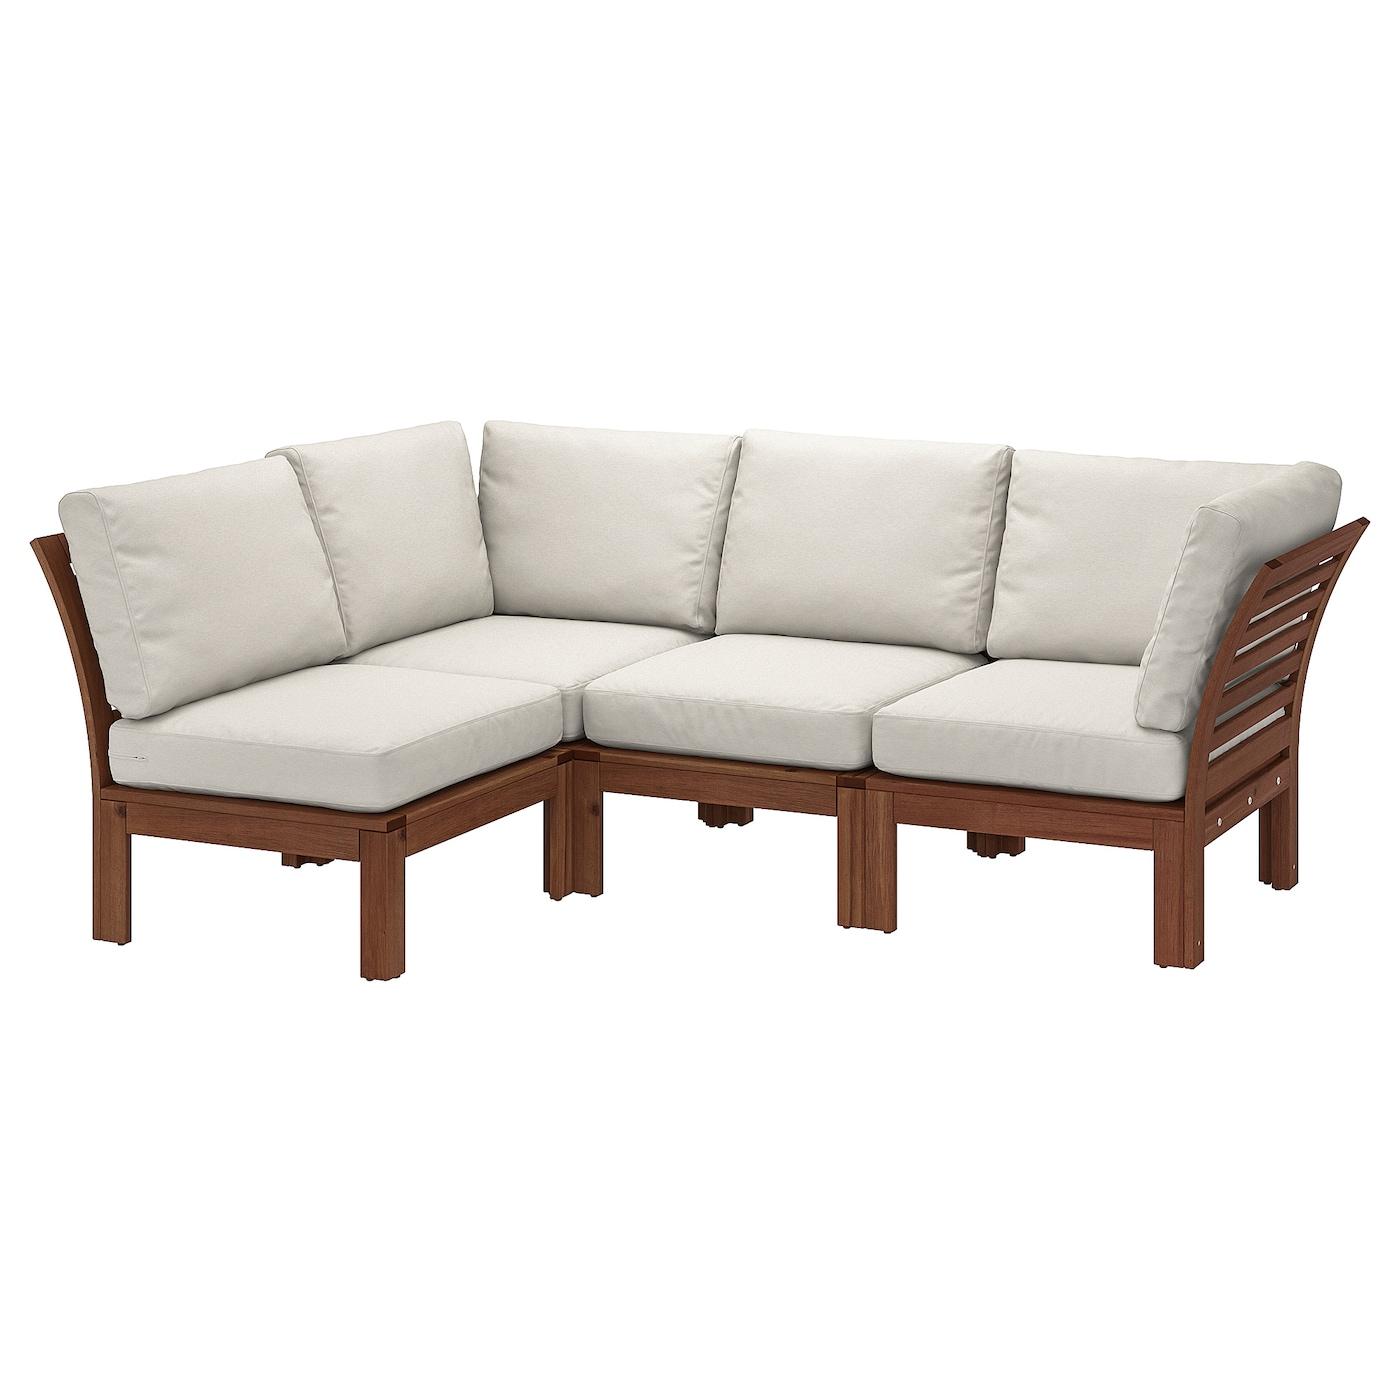 Modular corner sofa 3-seat, outdoor ÄPPLARÖ brown stained, Frösön/Duvholmen  beige